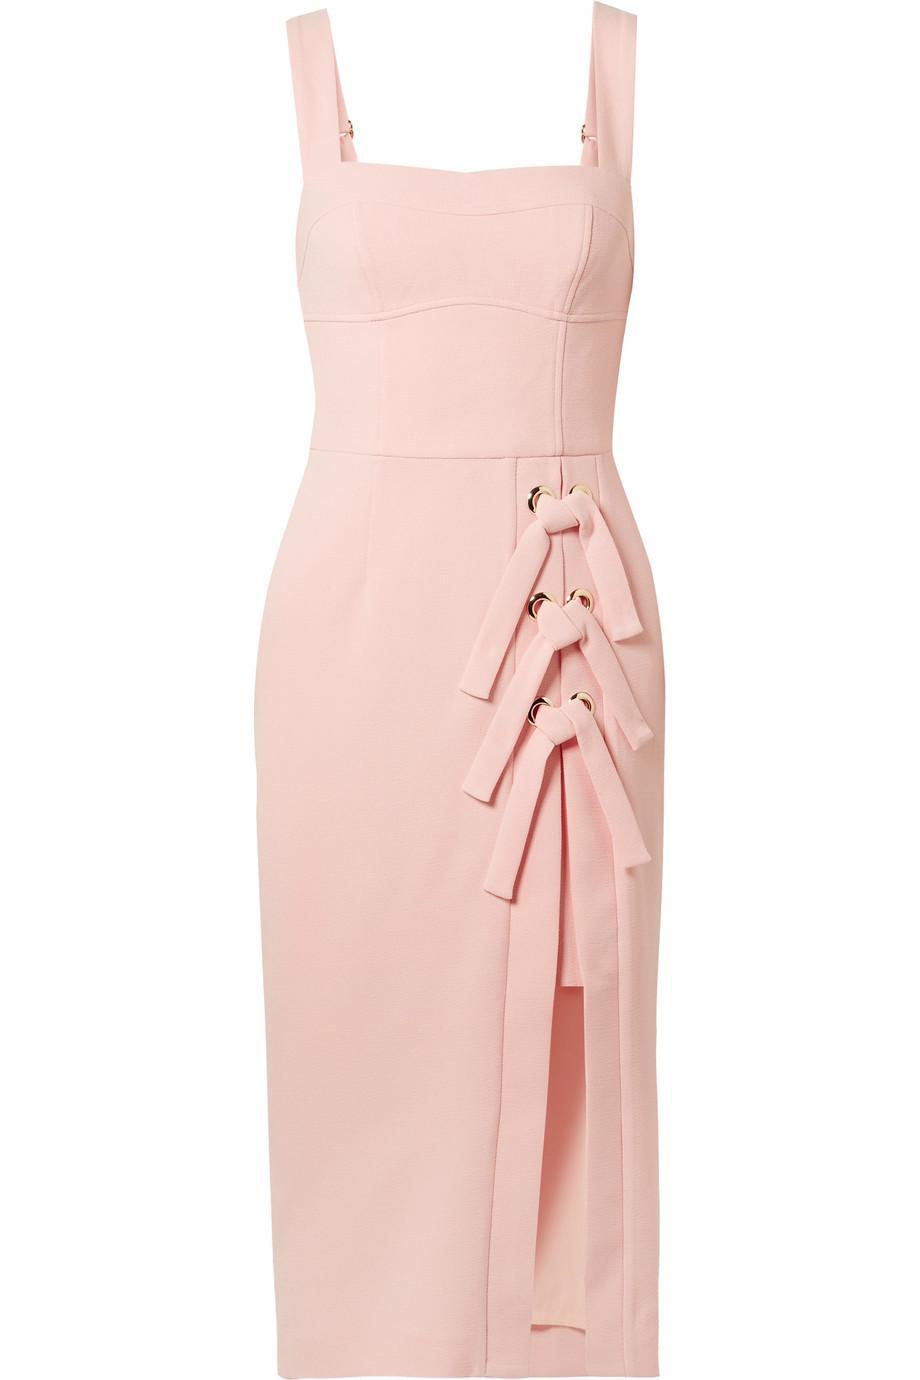 Celestina Lace-up Crepe Midi Dress - Pink Rebecca Vallance vvEMFu